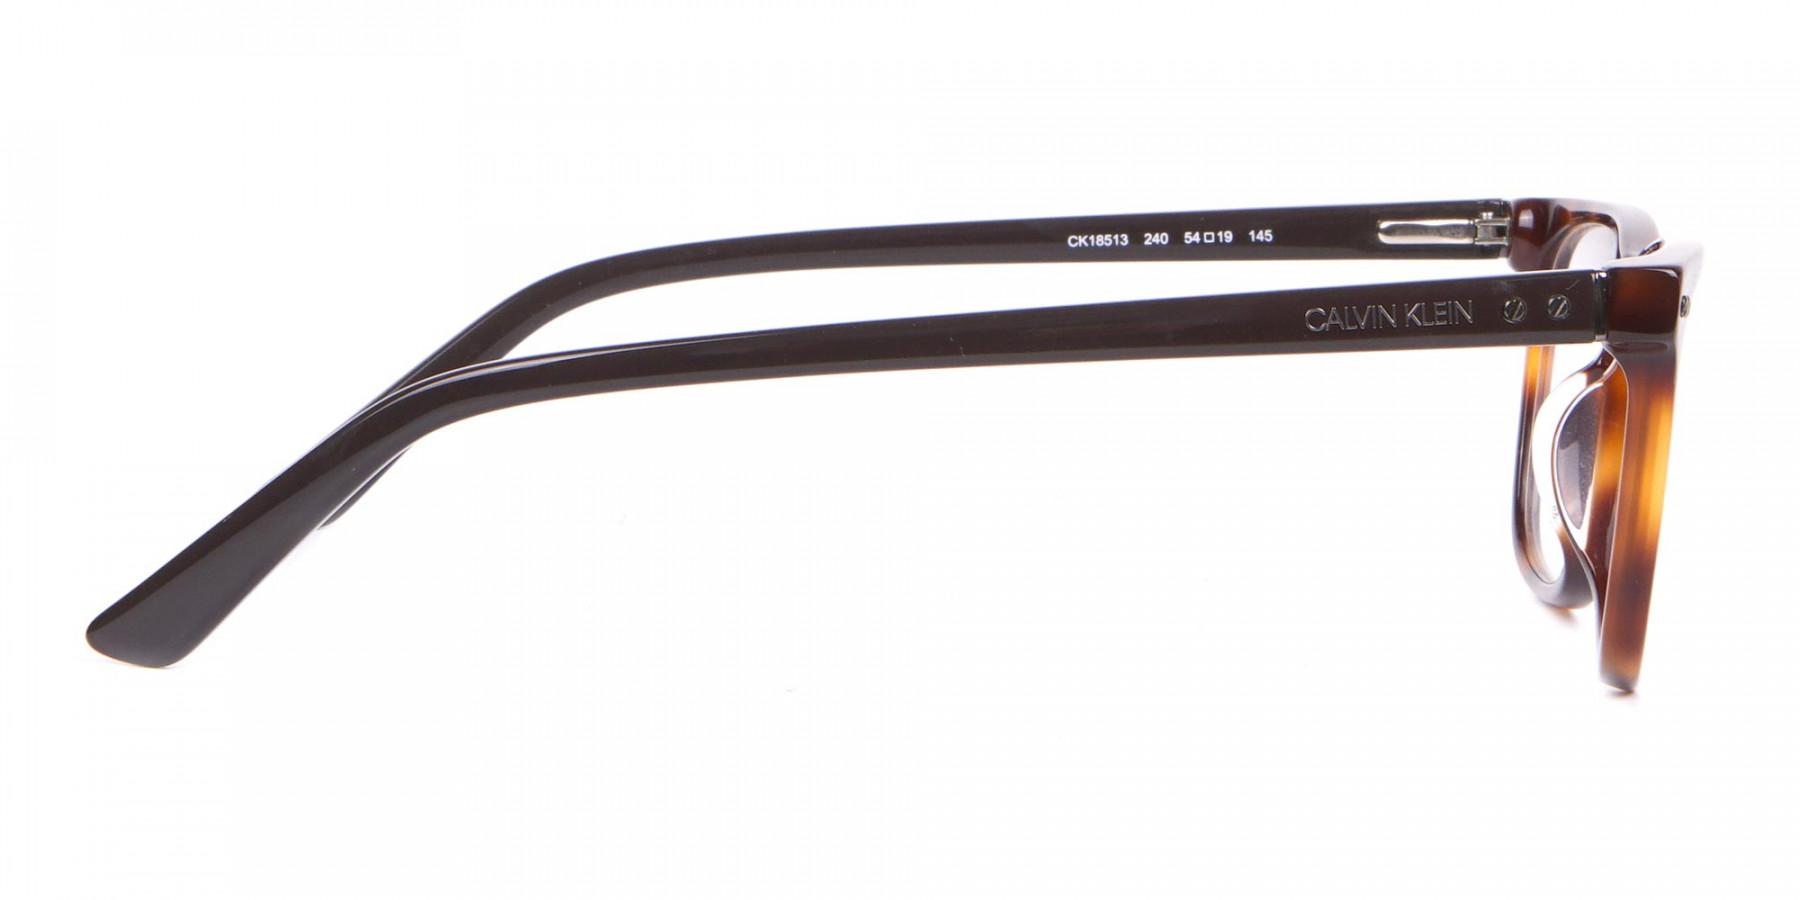 Calvin Klein CK18513 Rectangular Glasses in Brown Tortoise-1